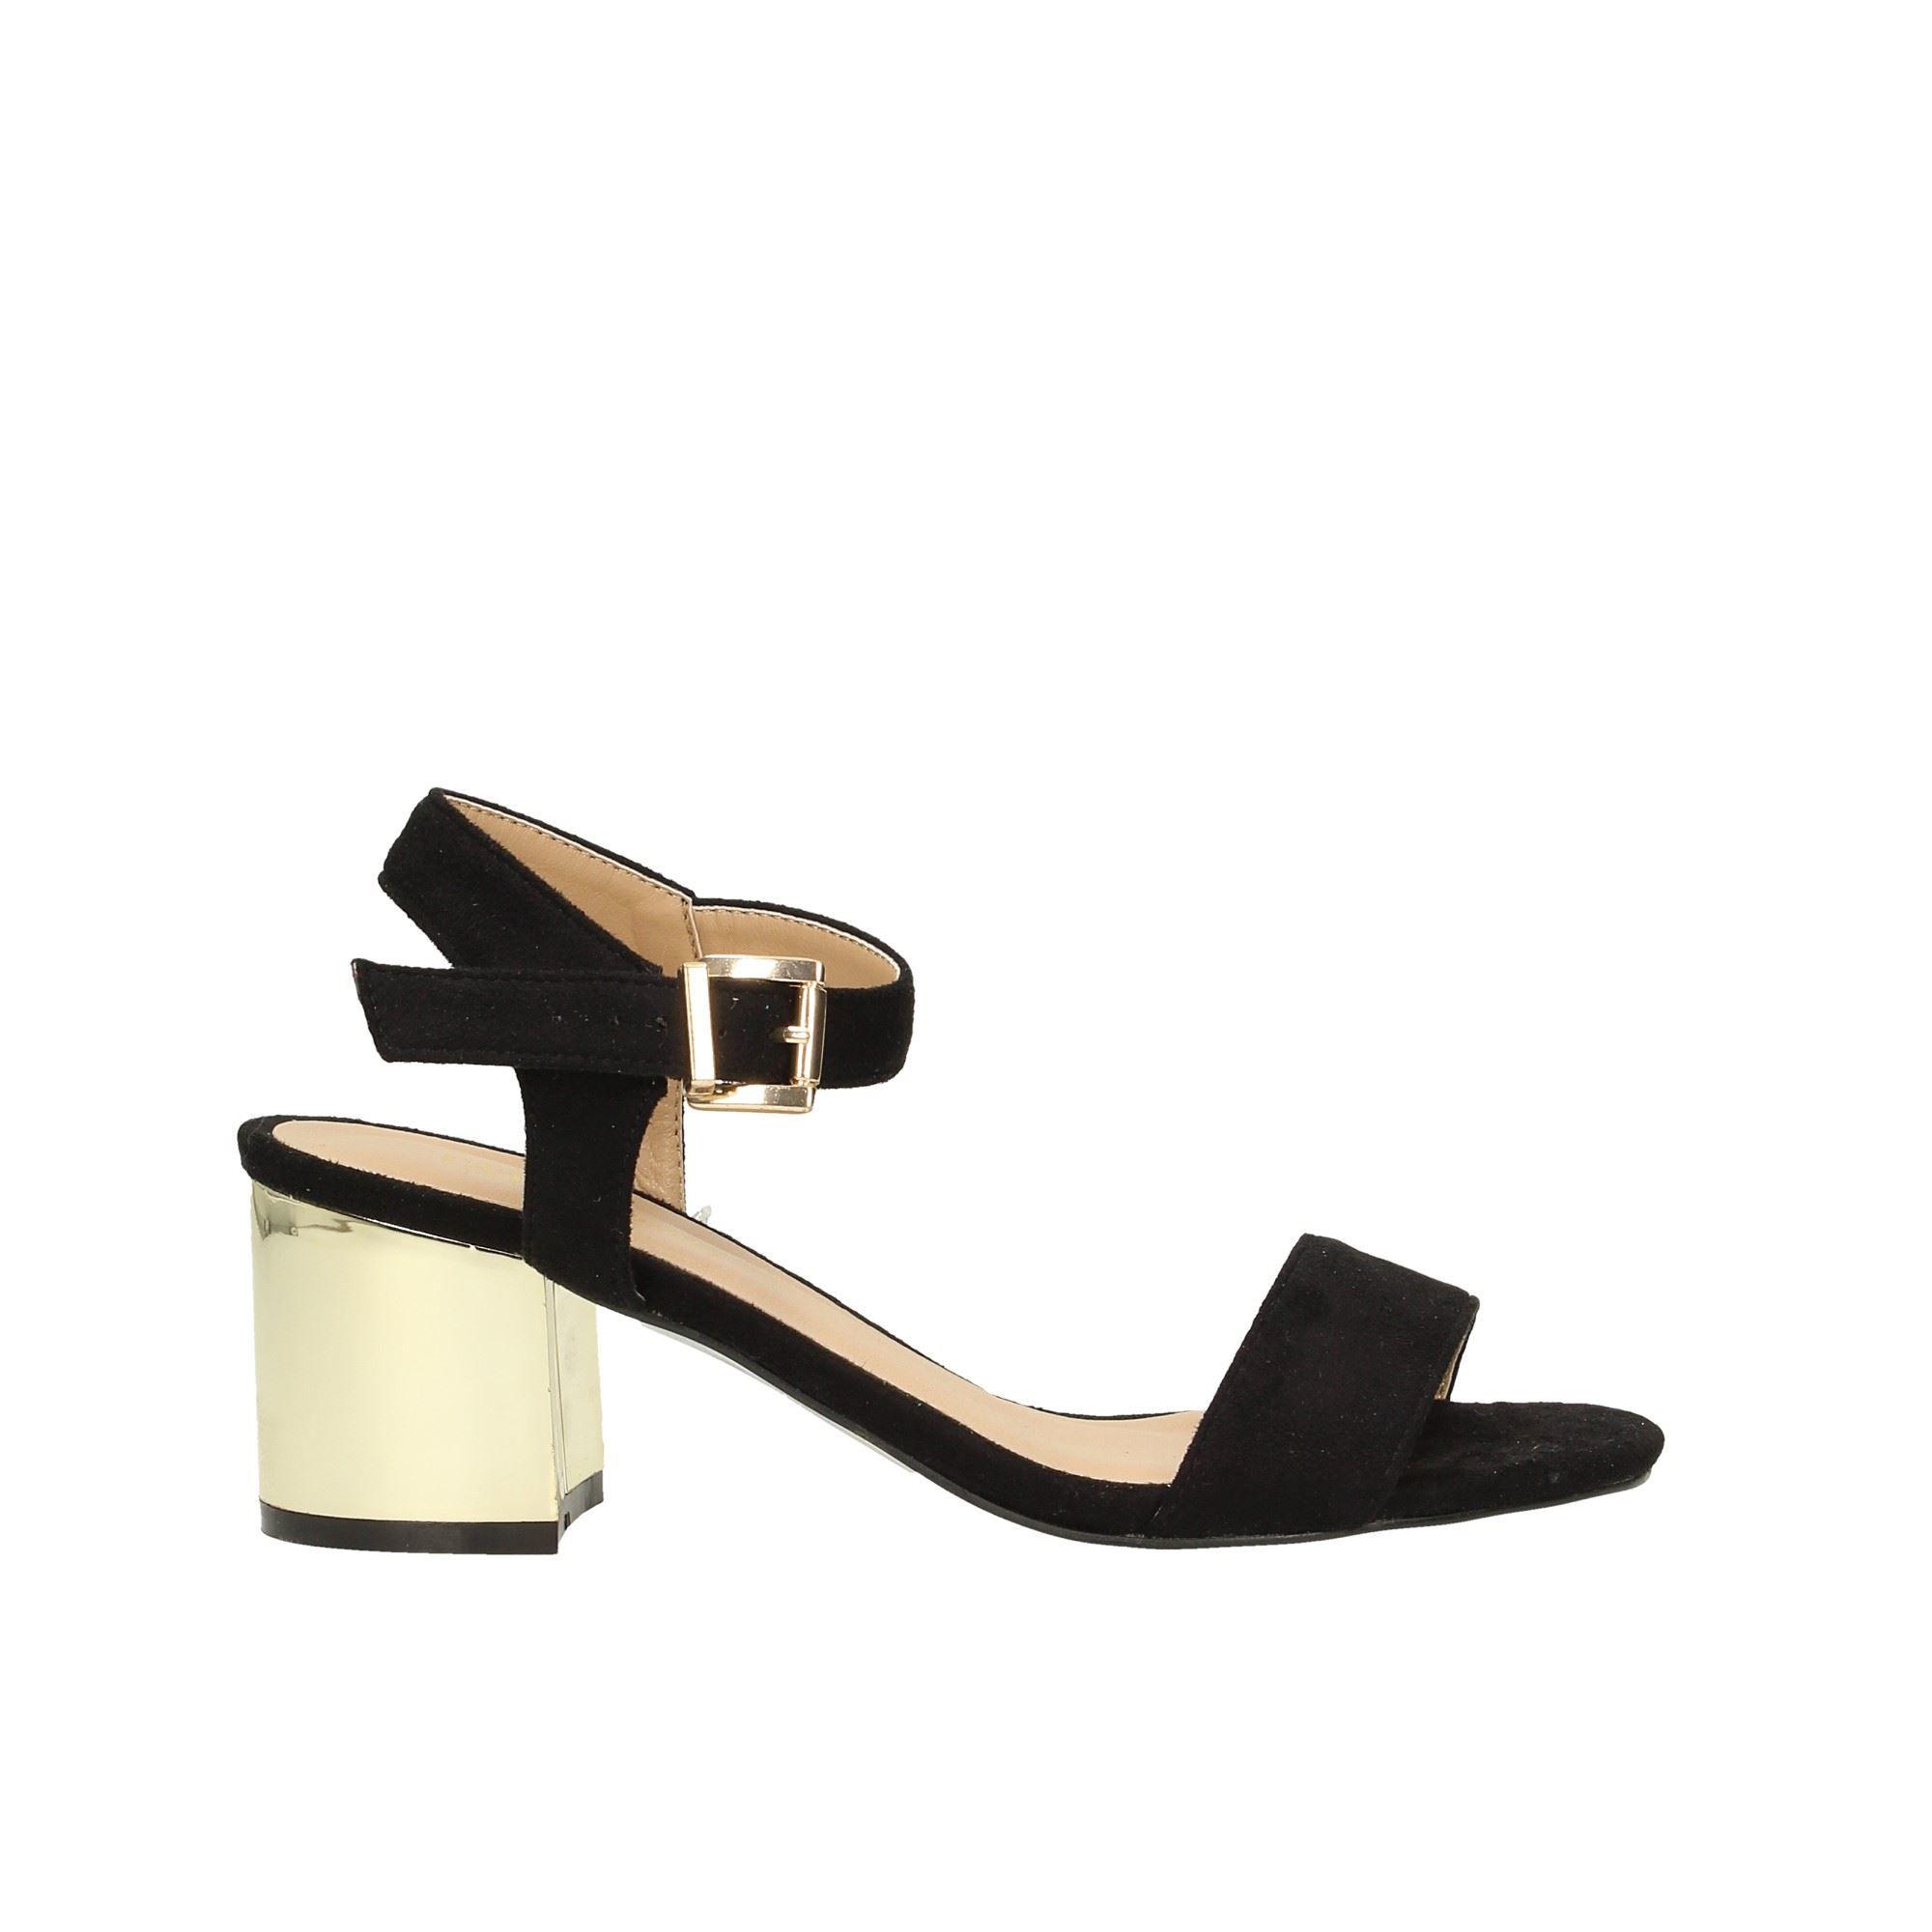 #Sandals #Tata #Summer2017